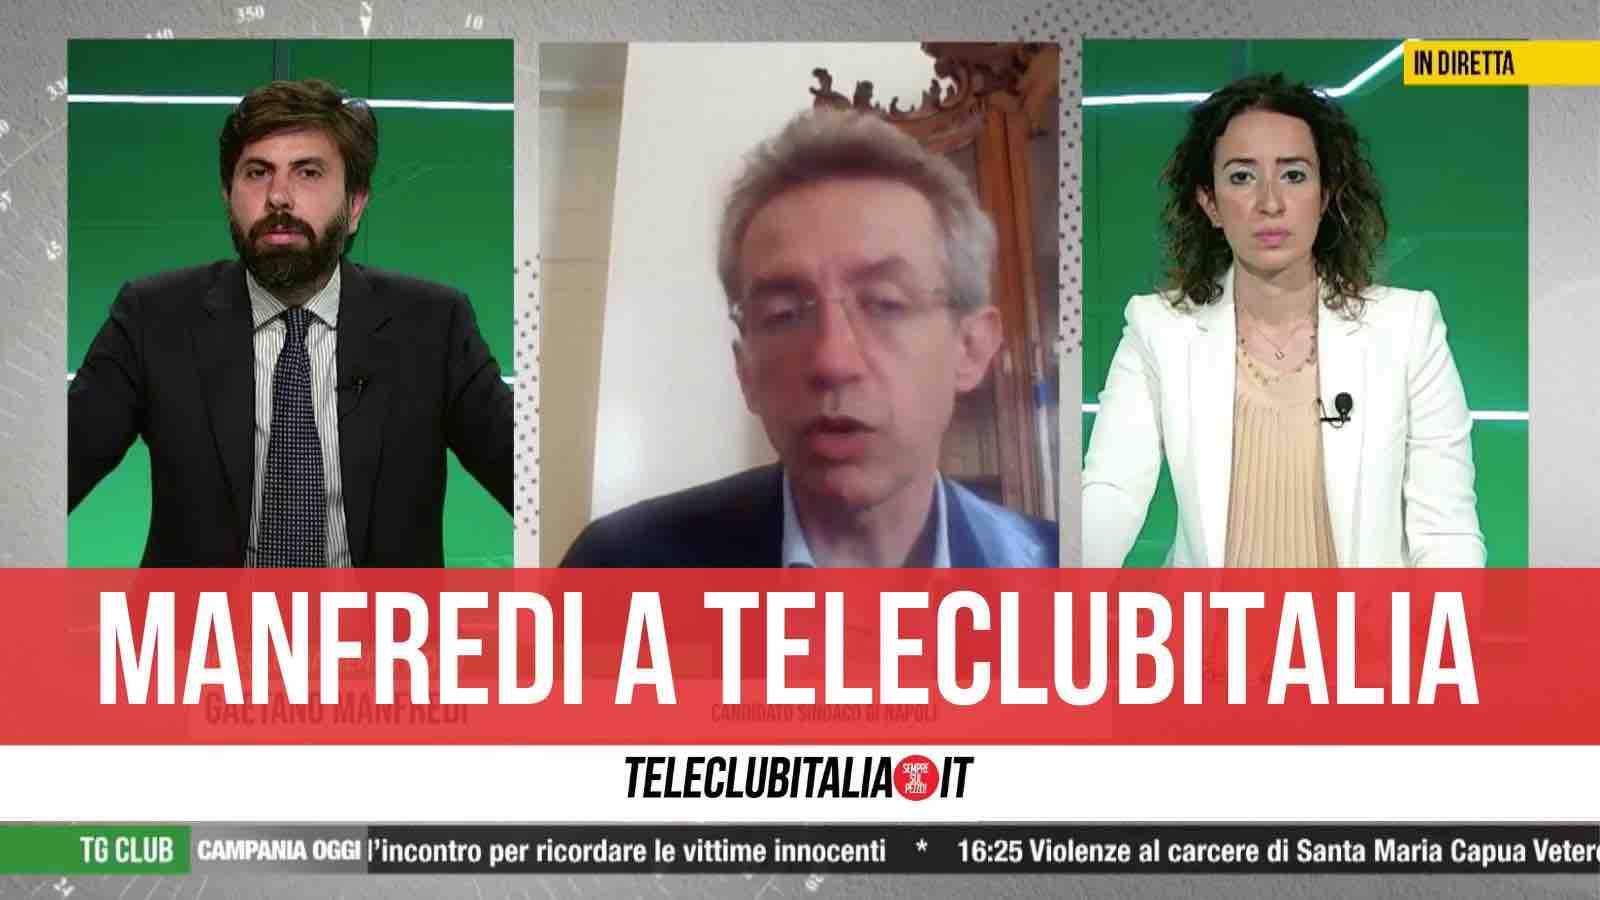 manfredi teleclubitalia